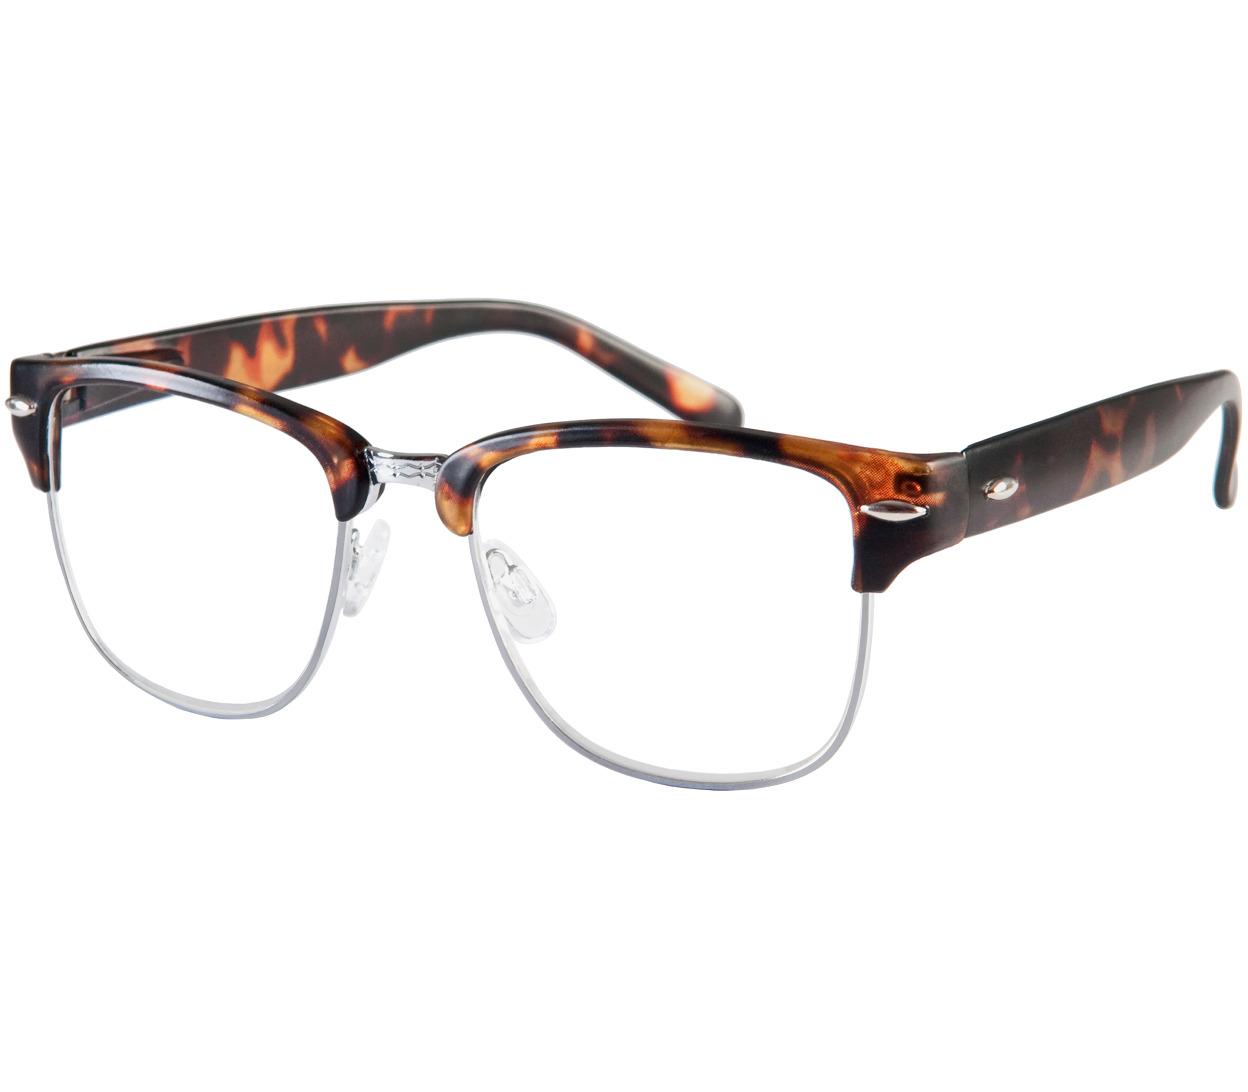 Main Image (Angle) - Harvard (Tortoiseshell) Retro Reading Glasses